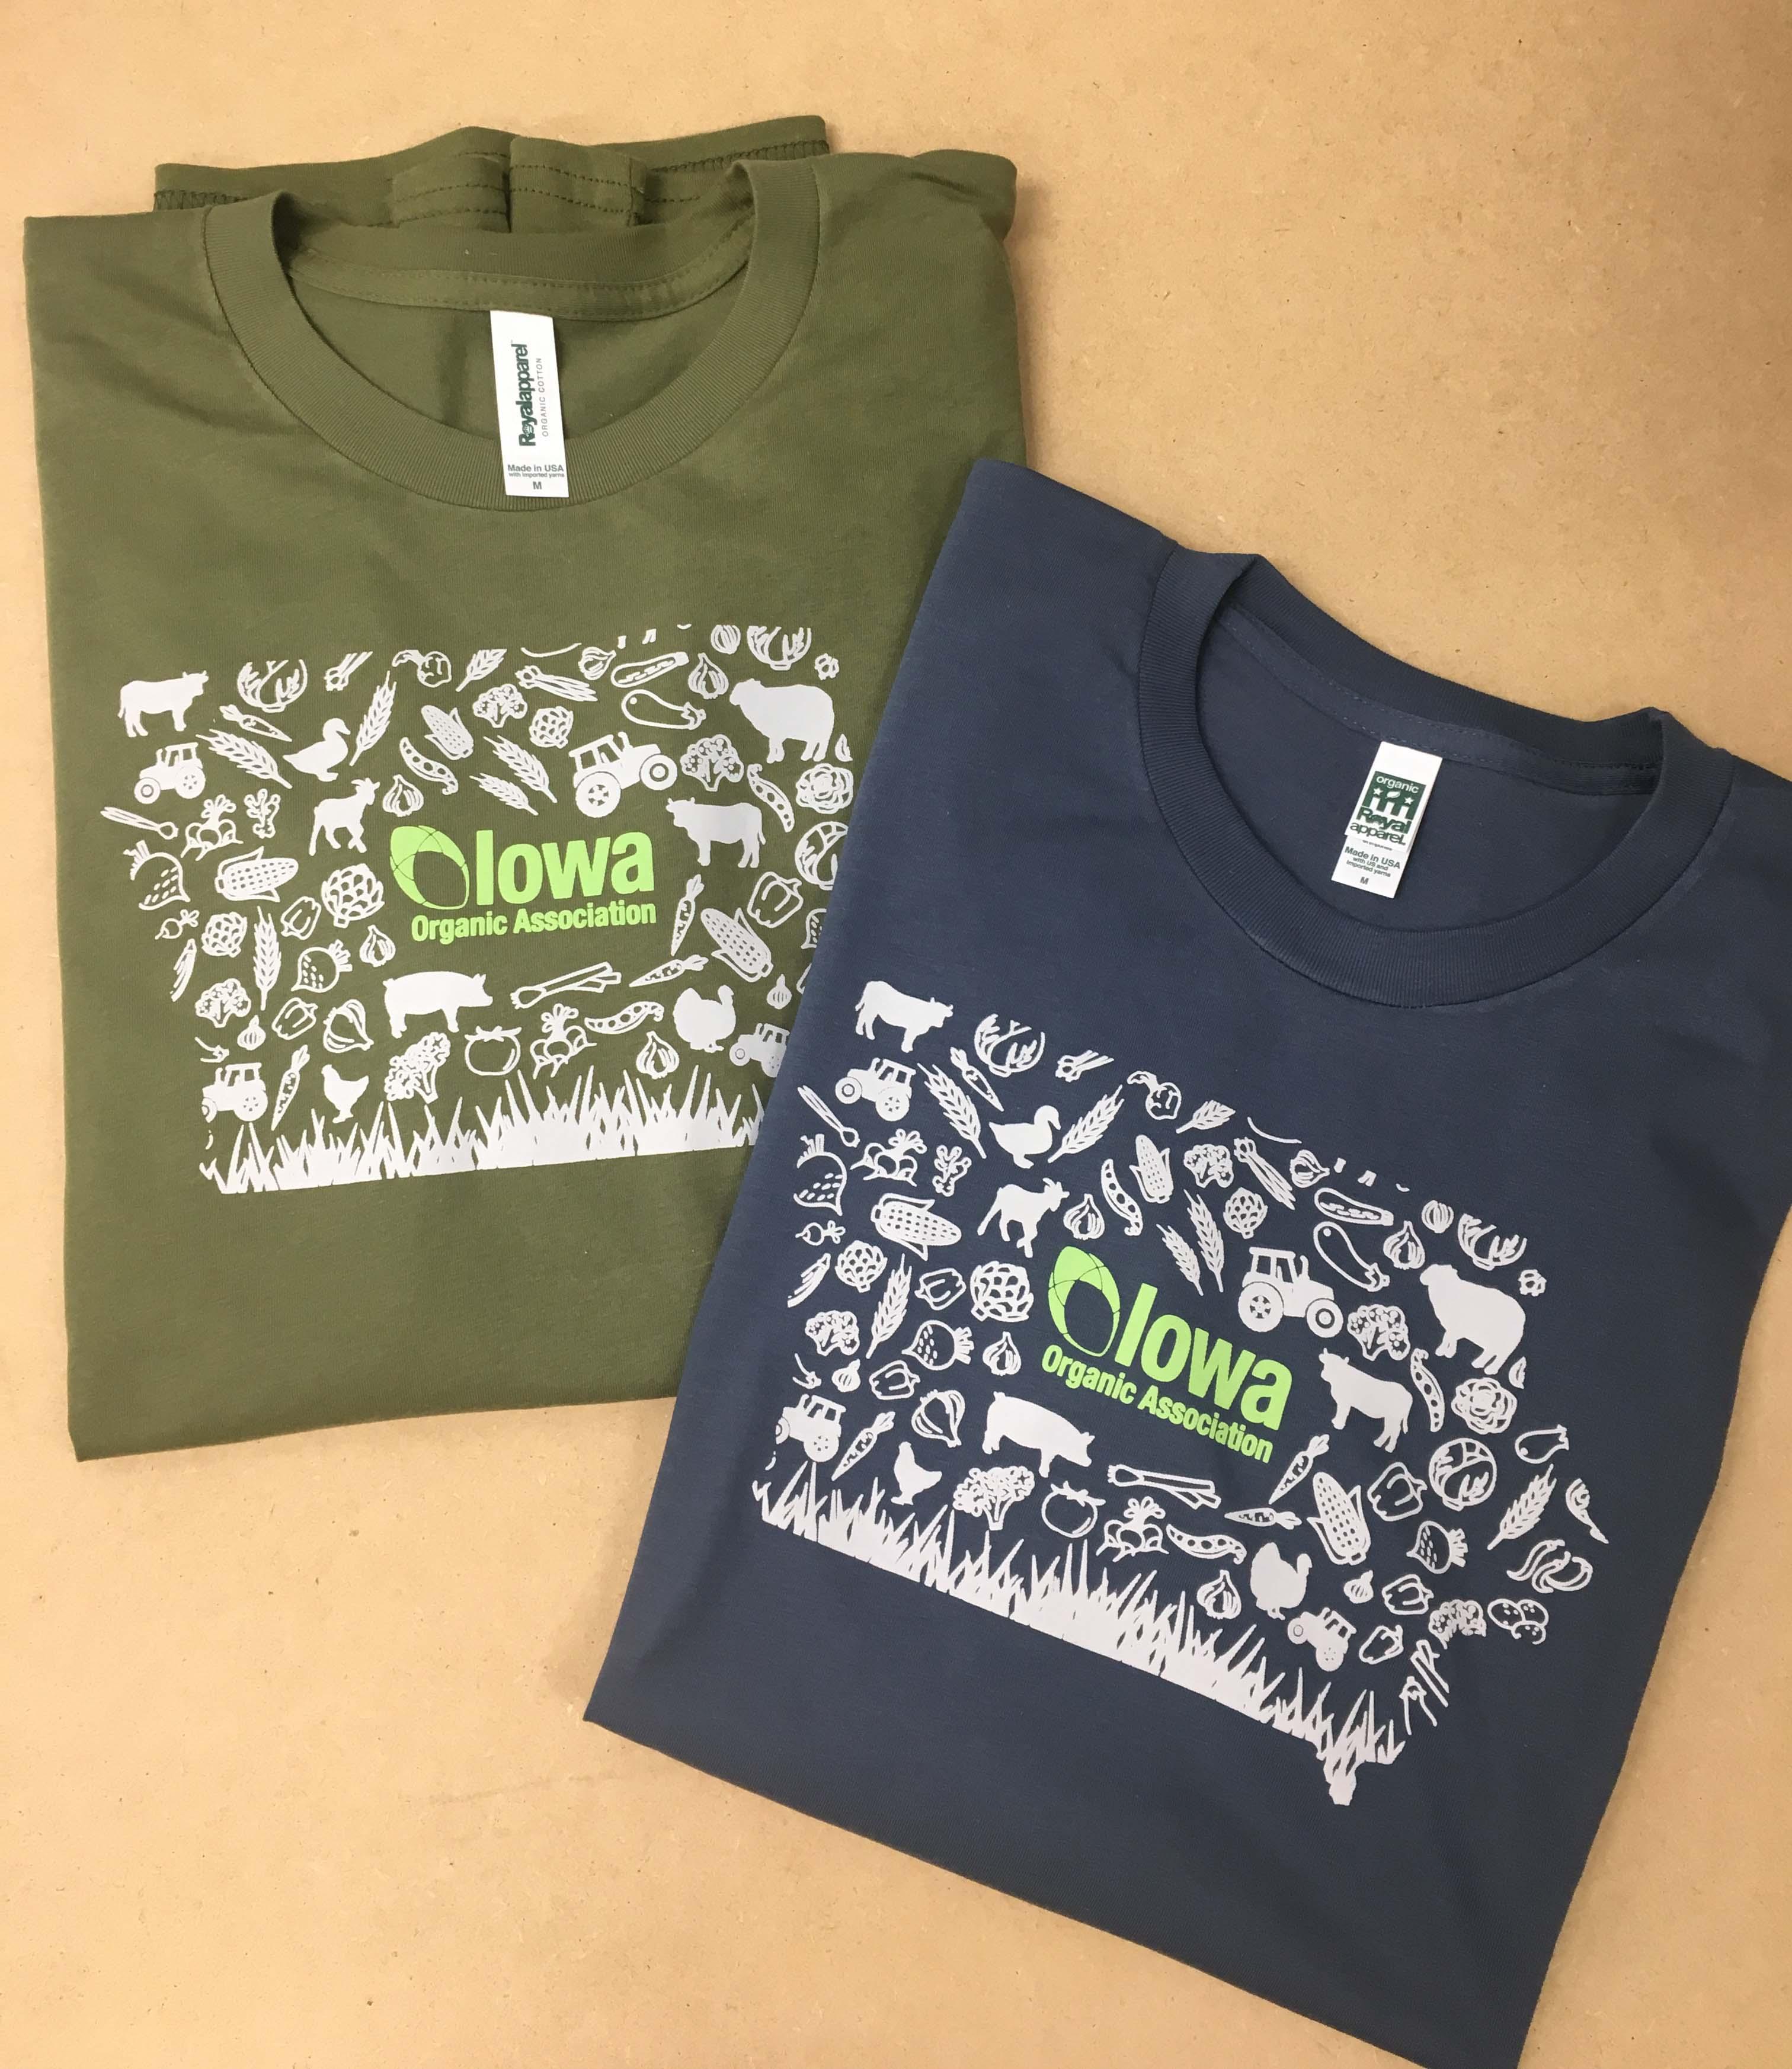 IOA_t-shirt3.jpg